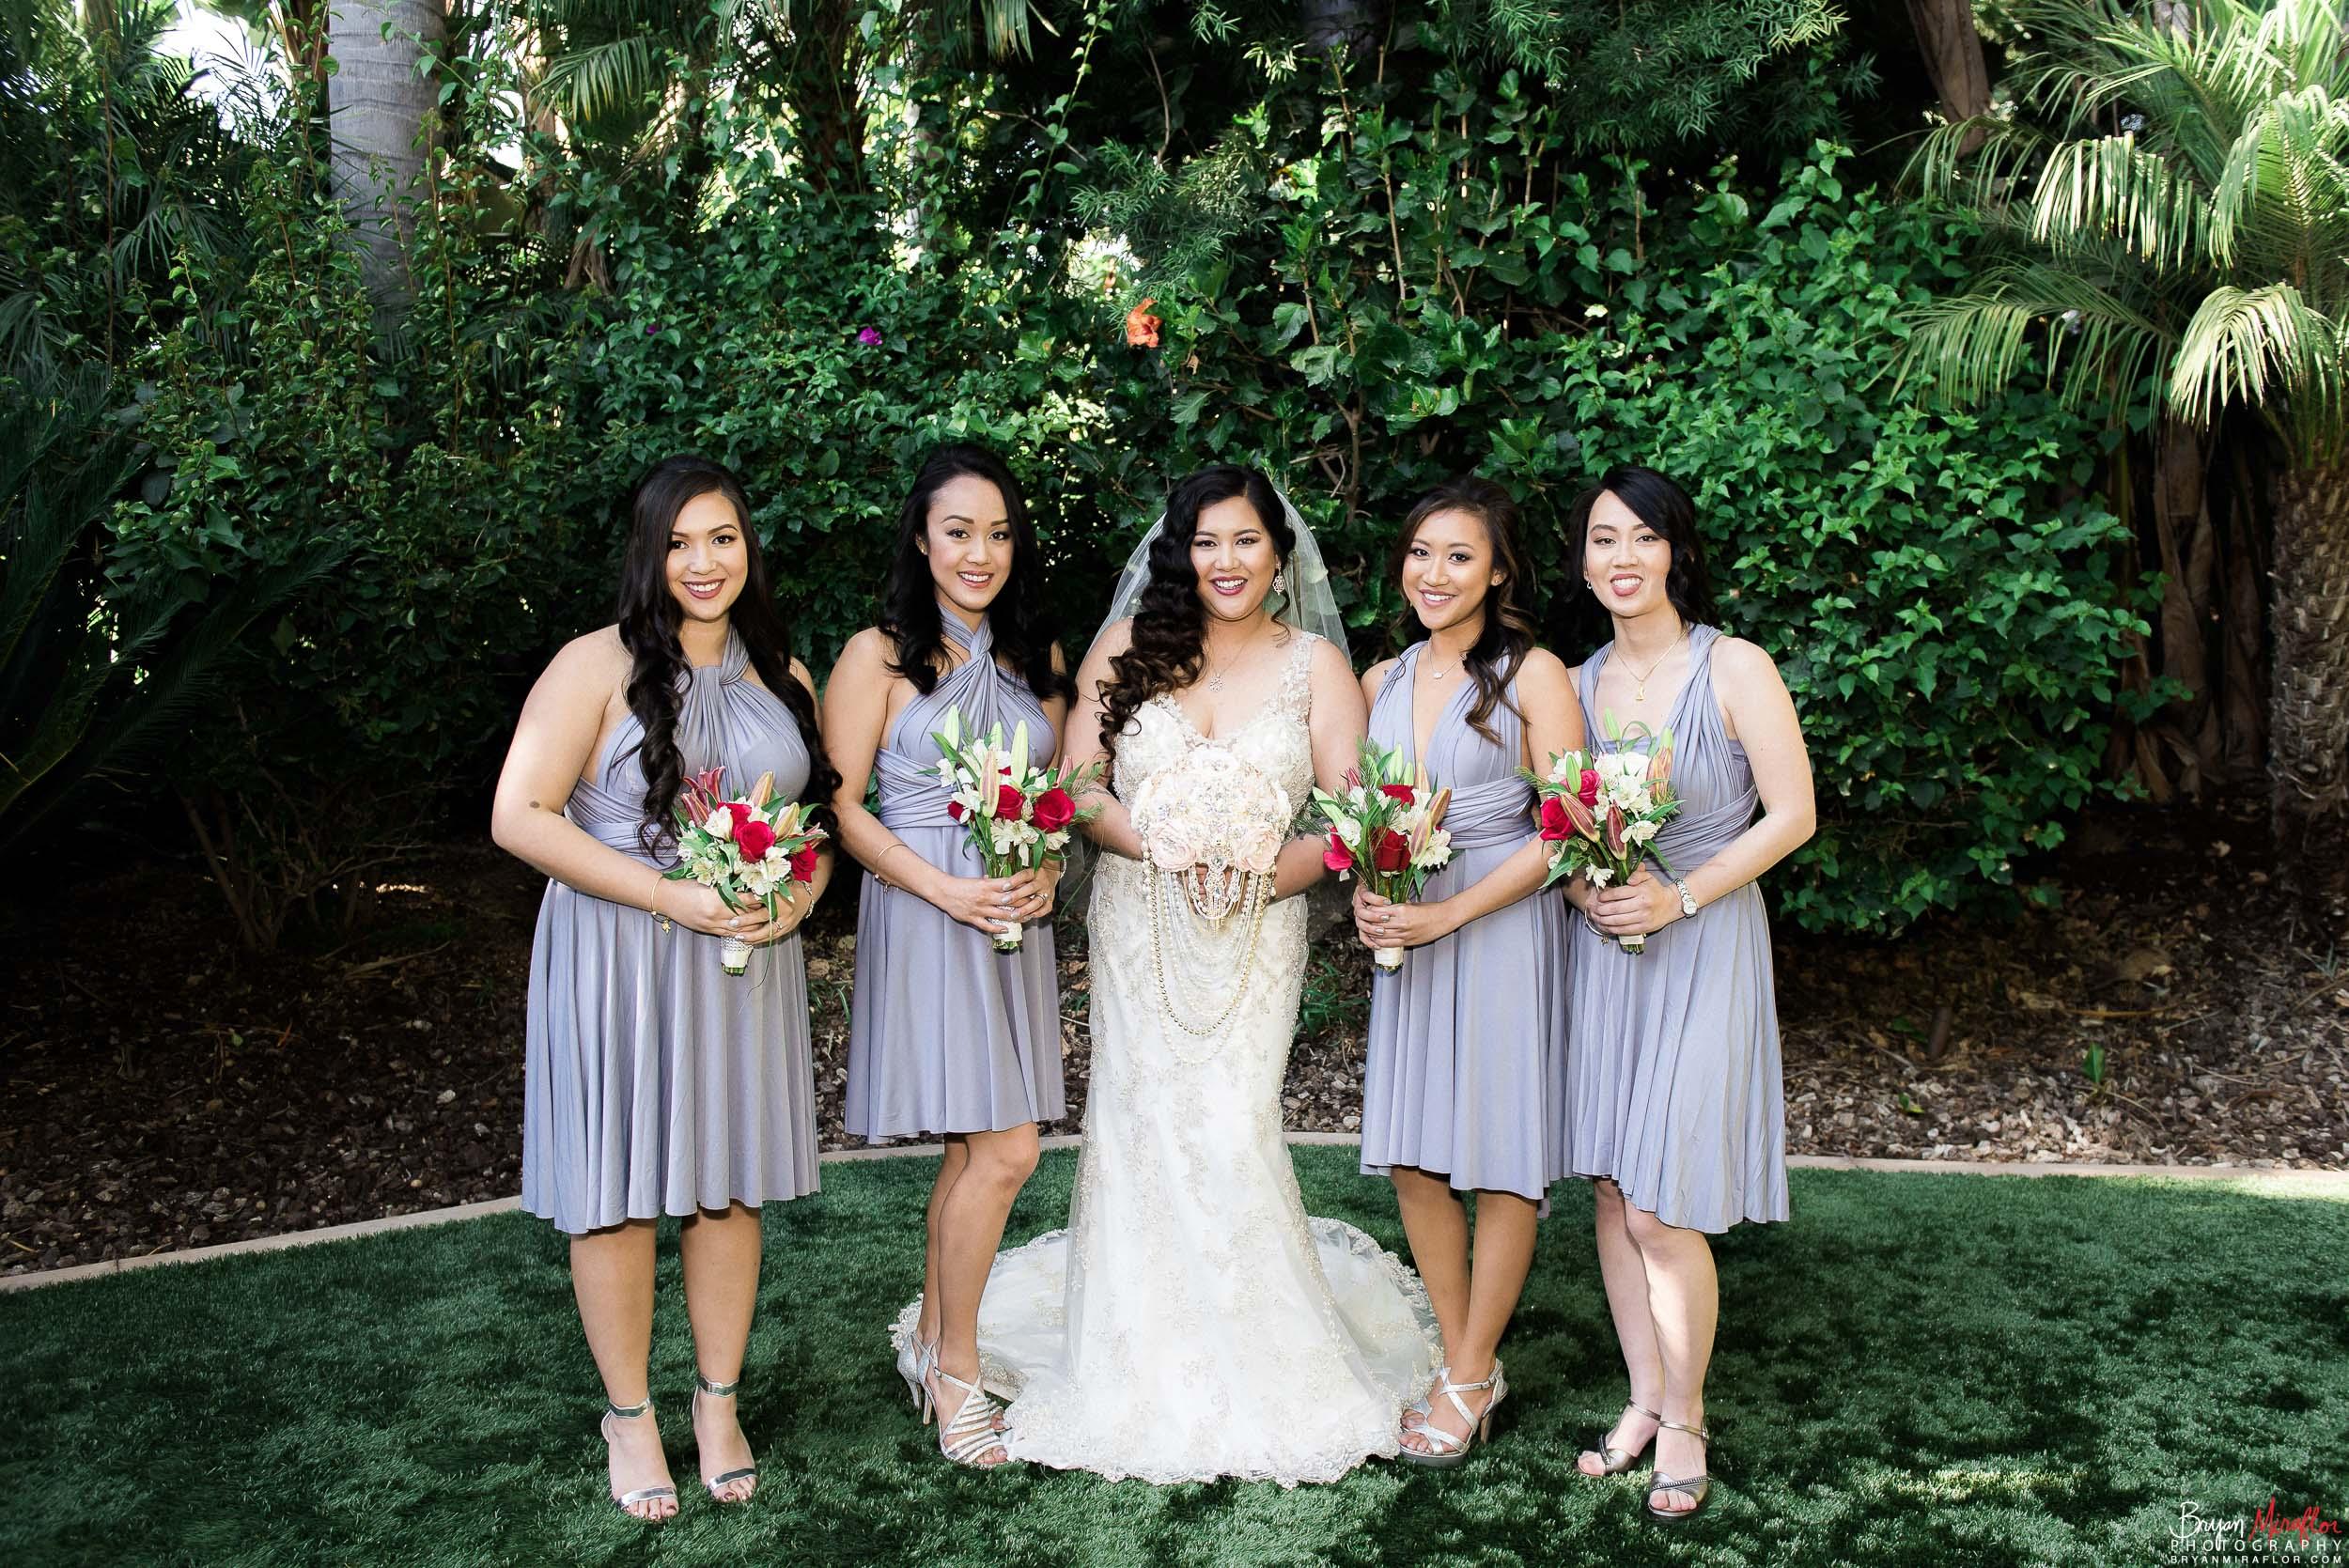 Bryan-Miraflor-Photography-Hannah-Jonathan-Married-Grand-Traditions-Estate-Gardens-Fallbrook-20171222-112.jpg